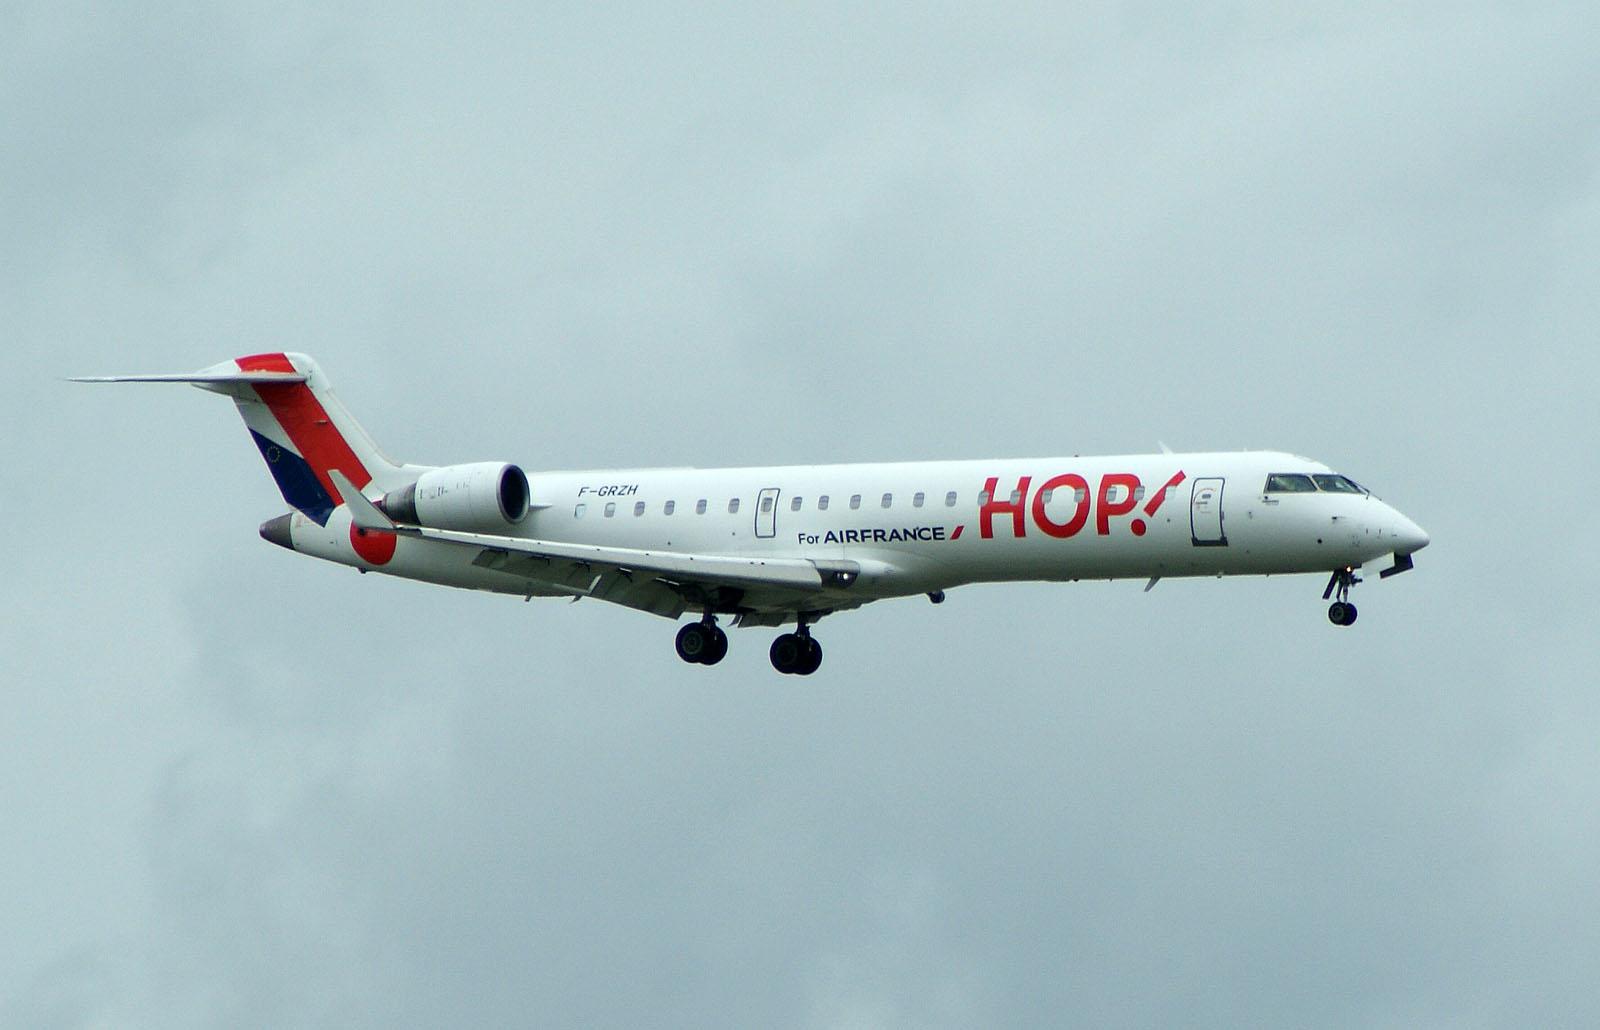 Bombardier CRJ700 F-GRZH HOP